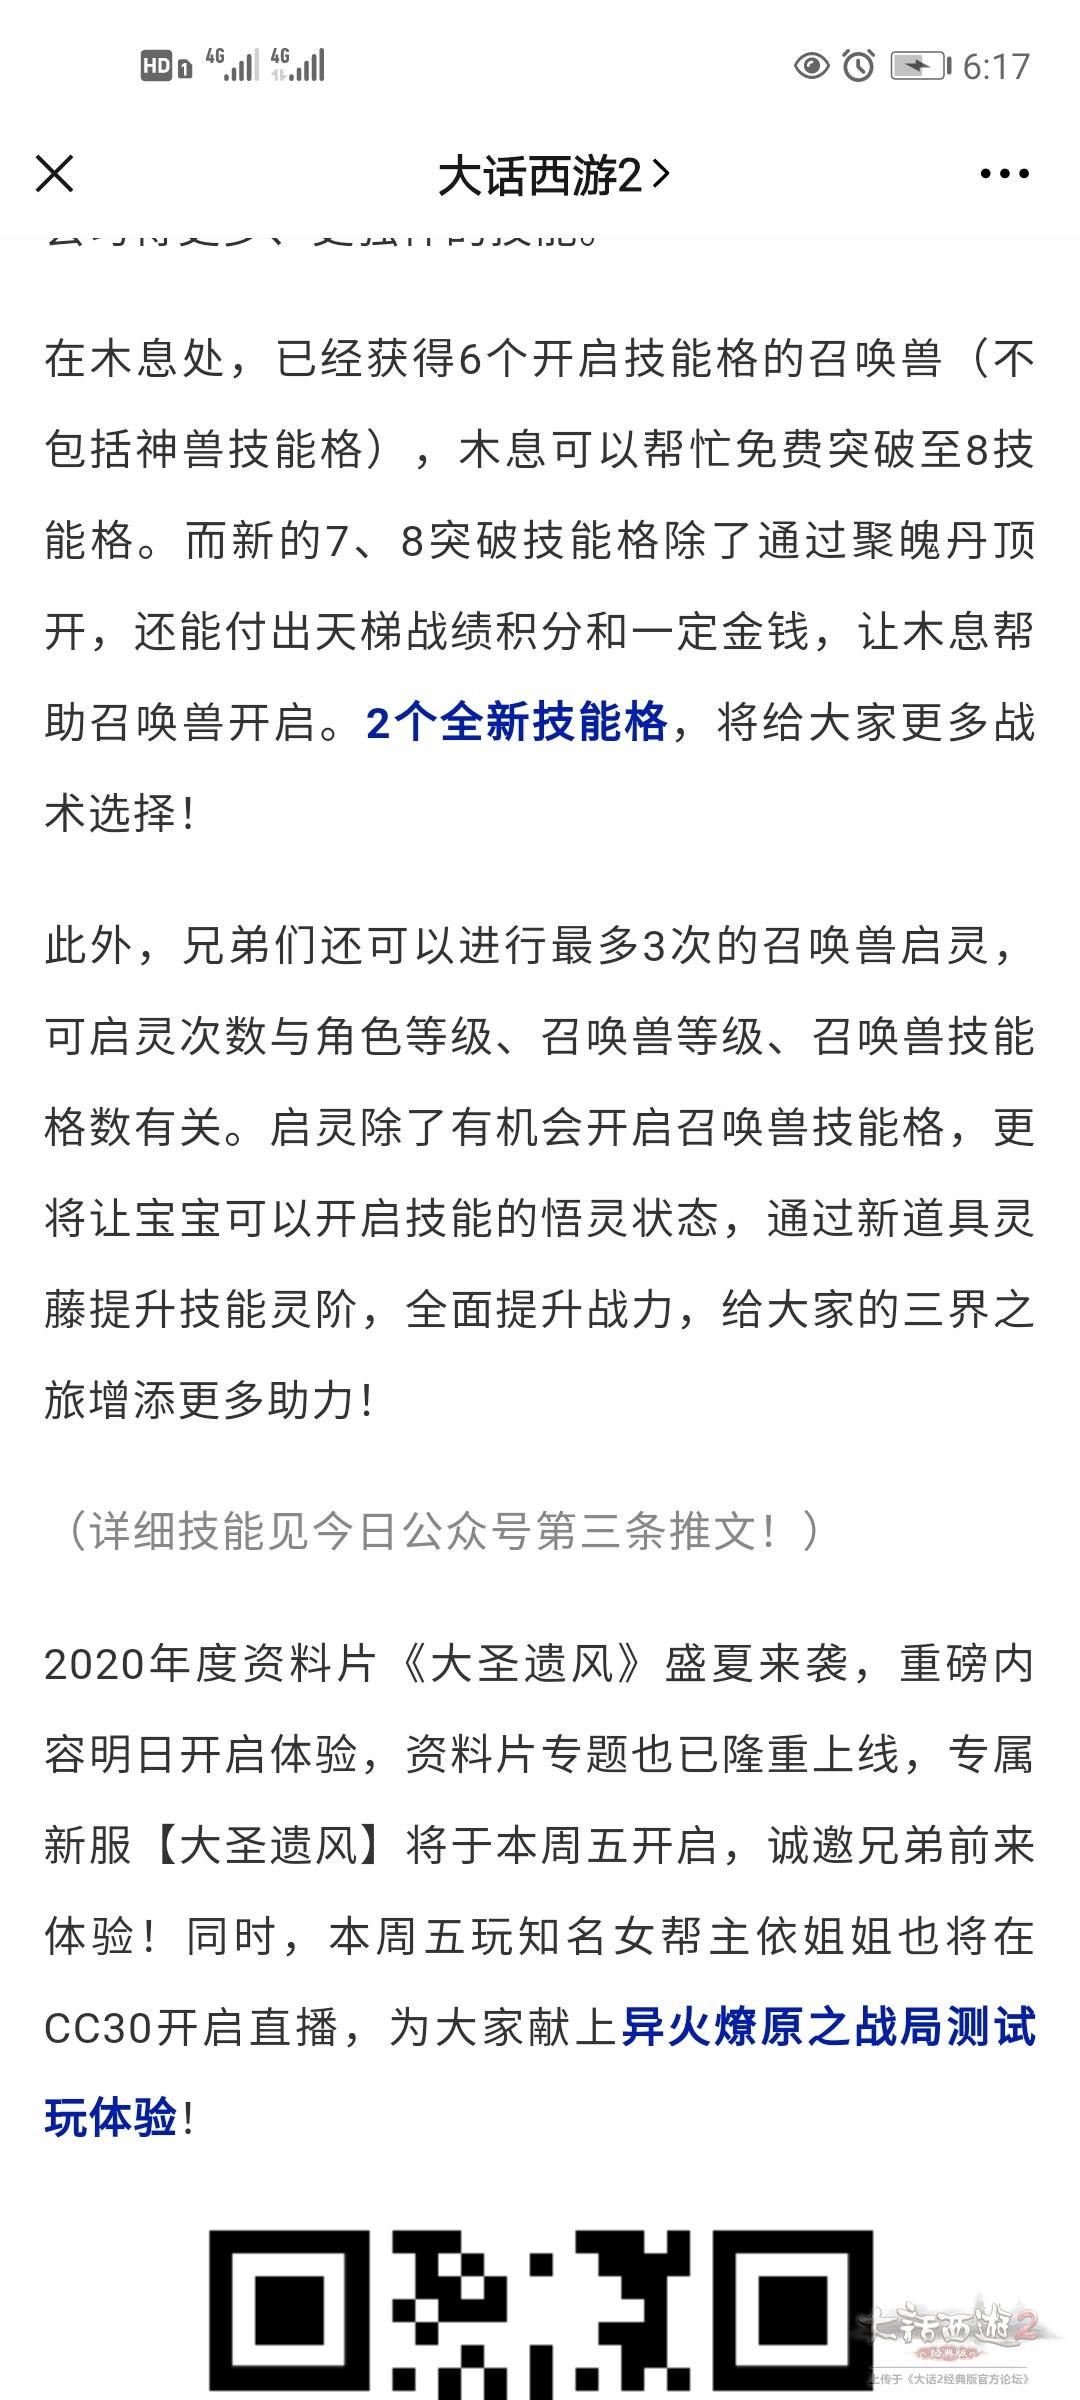 Screenshot_20200715_181745_com.tencent.mm.jpg